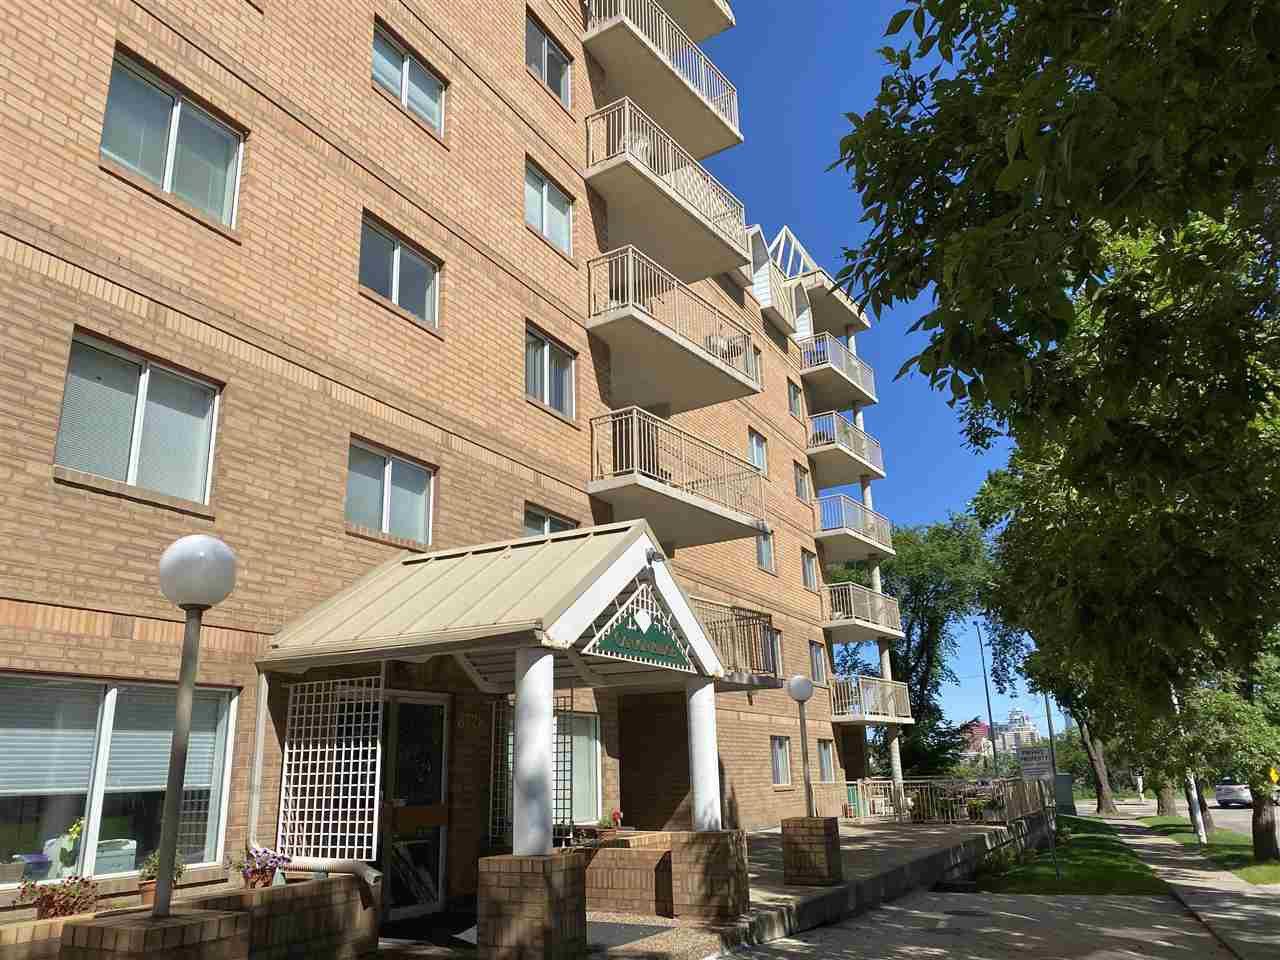 Main Photo: 404 8728 GATEWAY Boulevard in Edmonton: Zone 15 Condo for sale : MLS®# E4191192